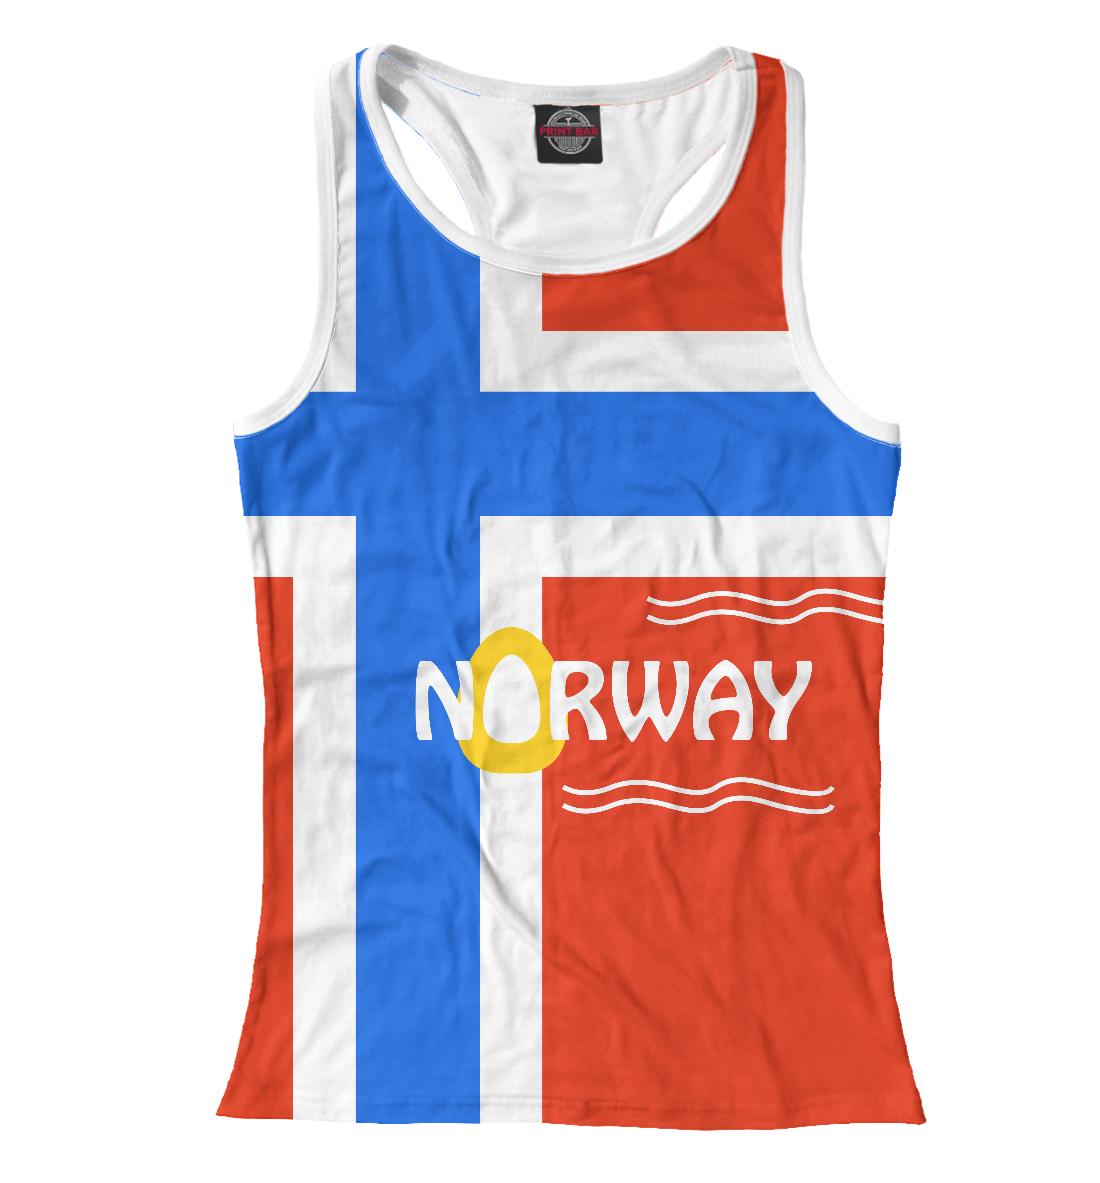 Купить Норвегия, Printbar, Майки борцовки, CTS-292150-mayb-1